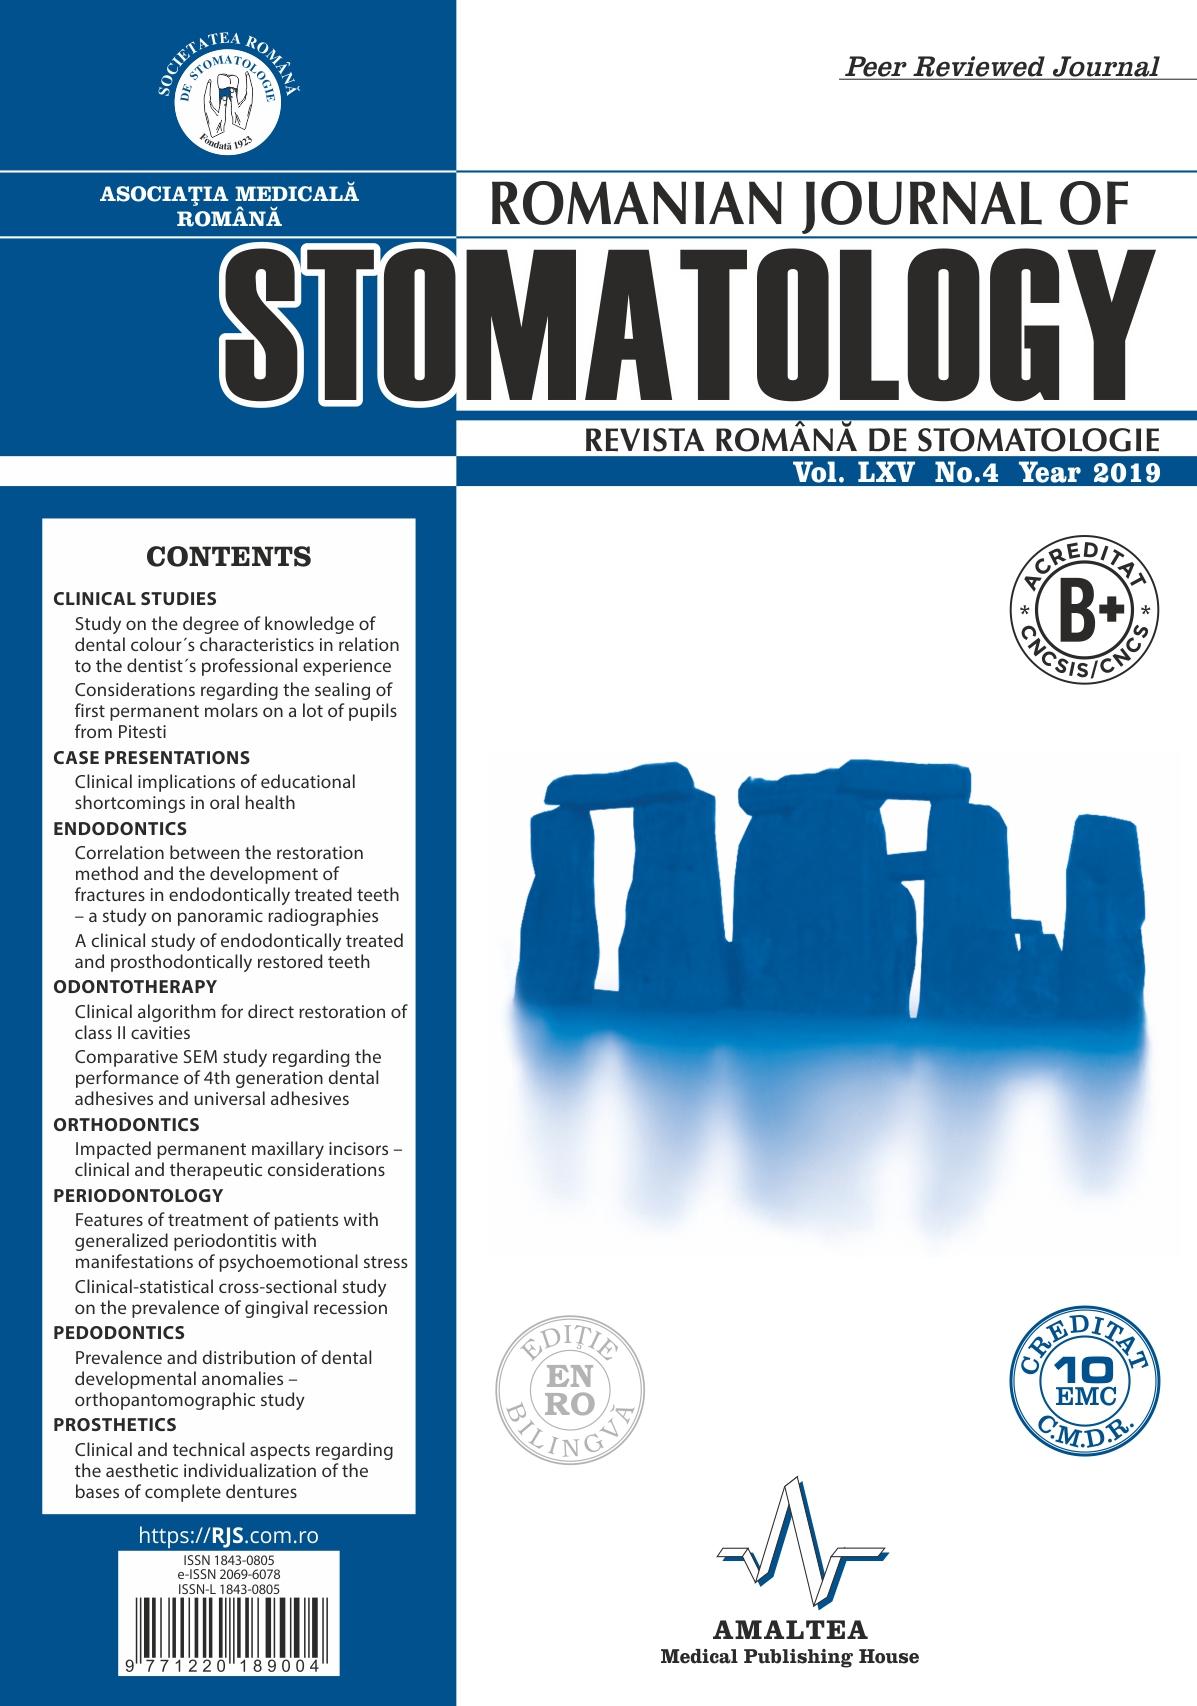 Revista Romana de STOMATOLOGIE - Romanian Journal of Stomatology, Vol. LXV, Nr. 4, An 2019